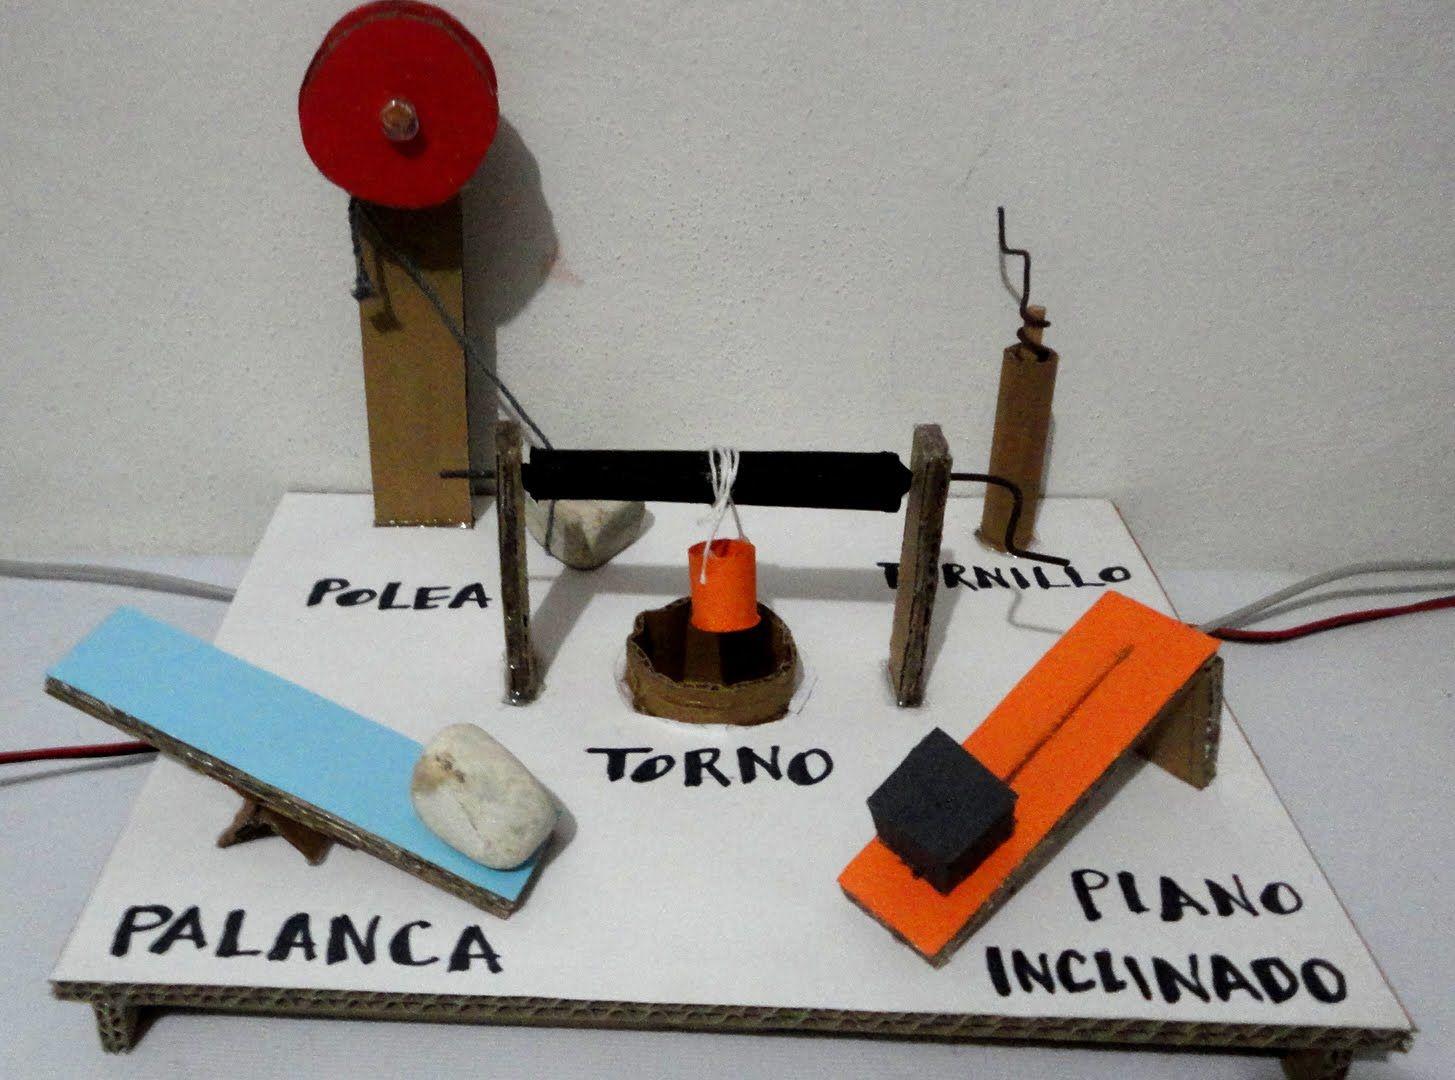 20 Ideas De Maquinas Simples Maquinas Simples Maquinas Simples Para Niños Maquetas De Maquinas Simples